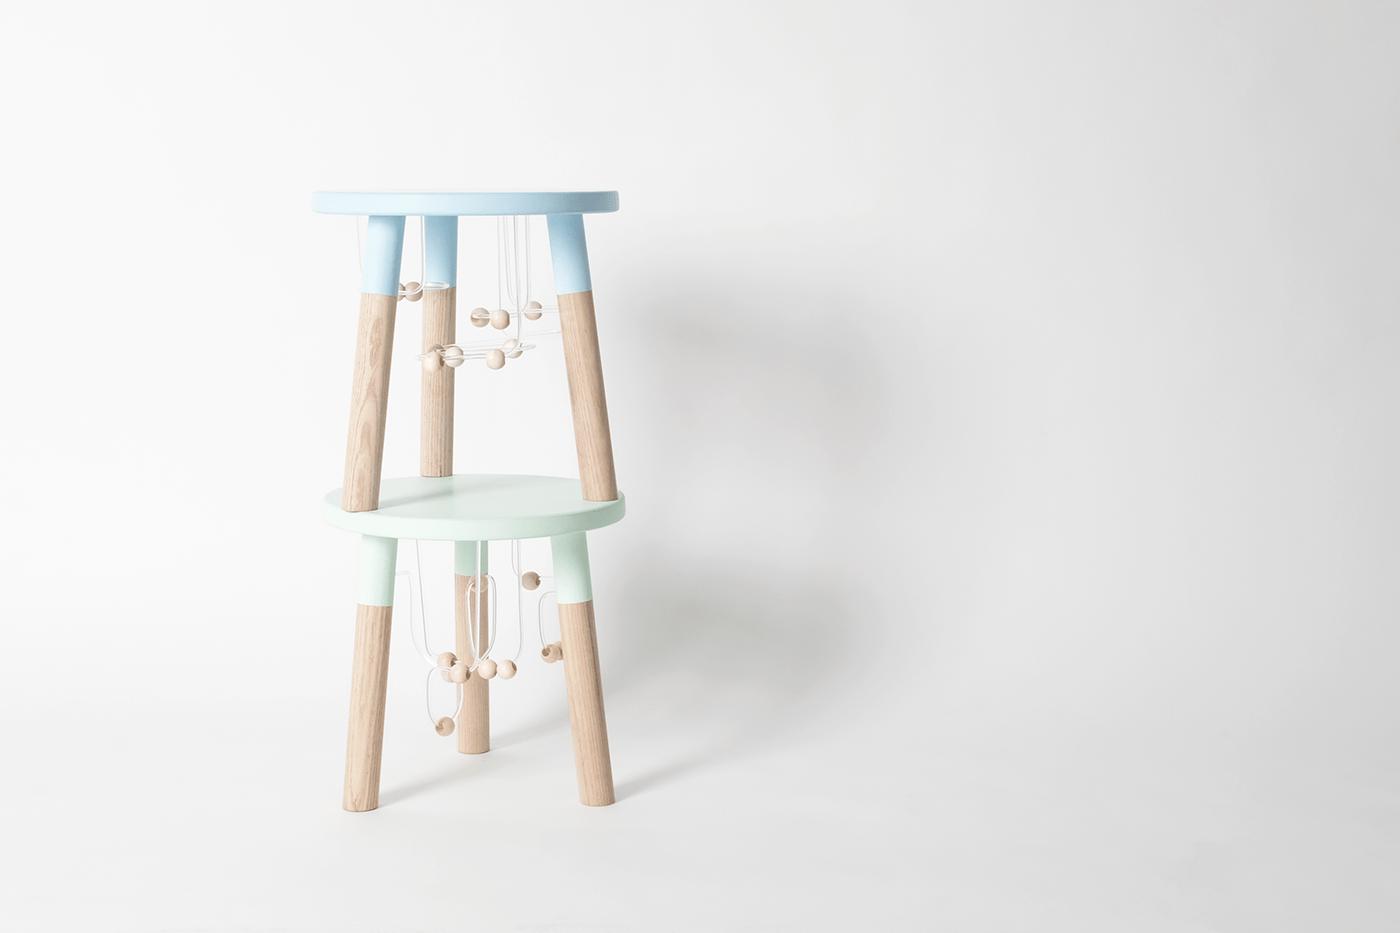 children furniture furniture design  industrial design  kids design product design  stool toy design  toy